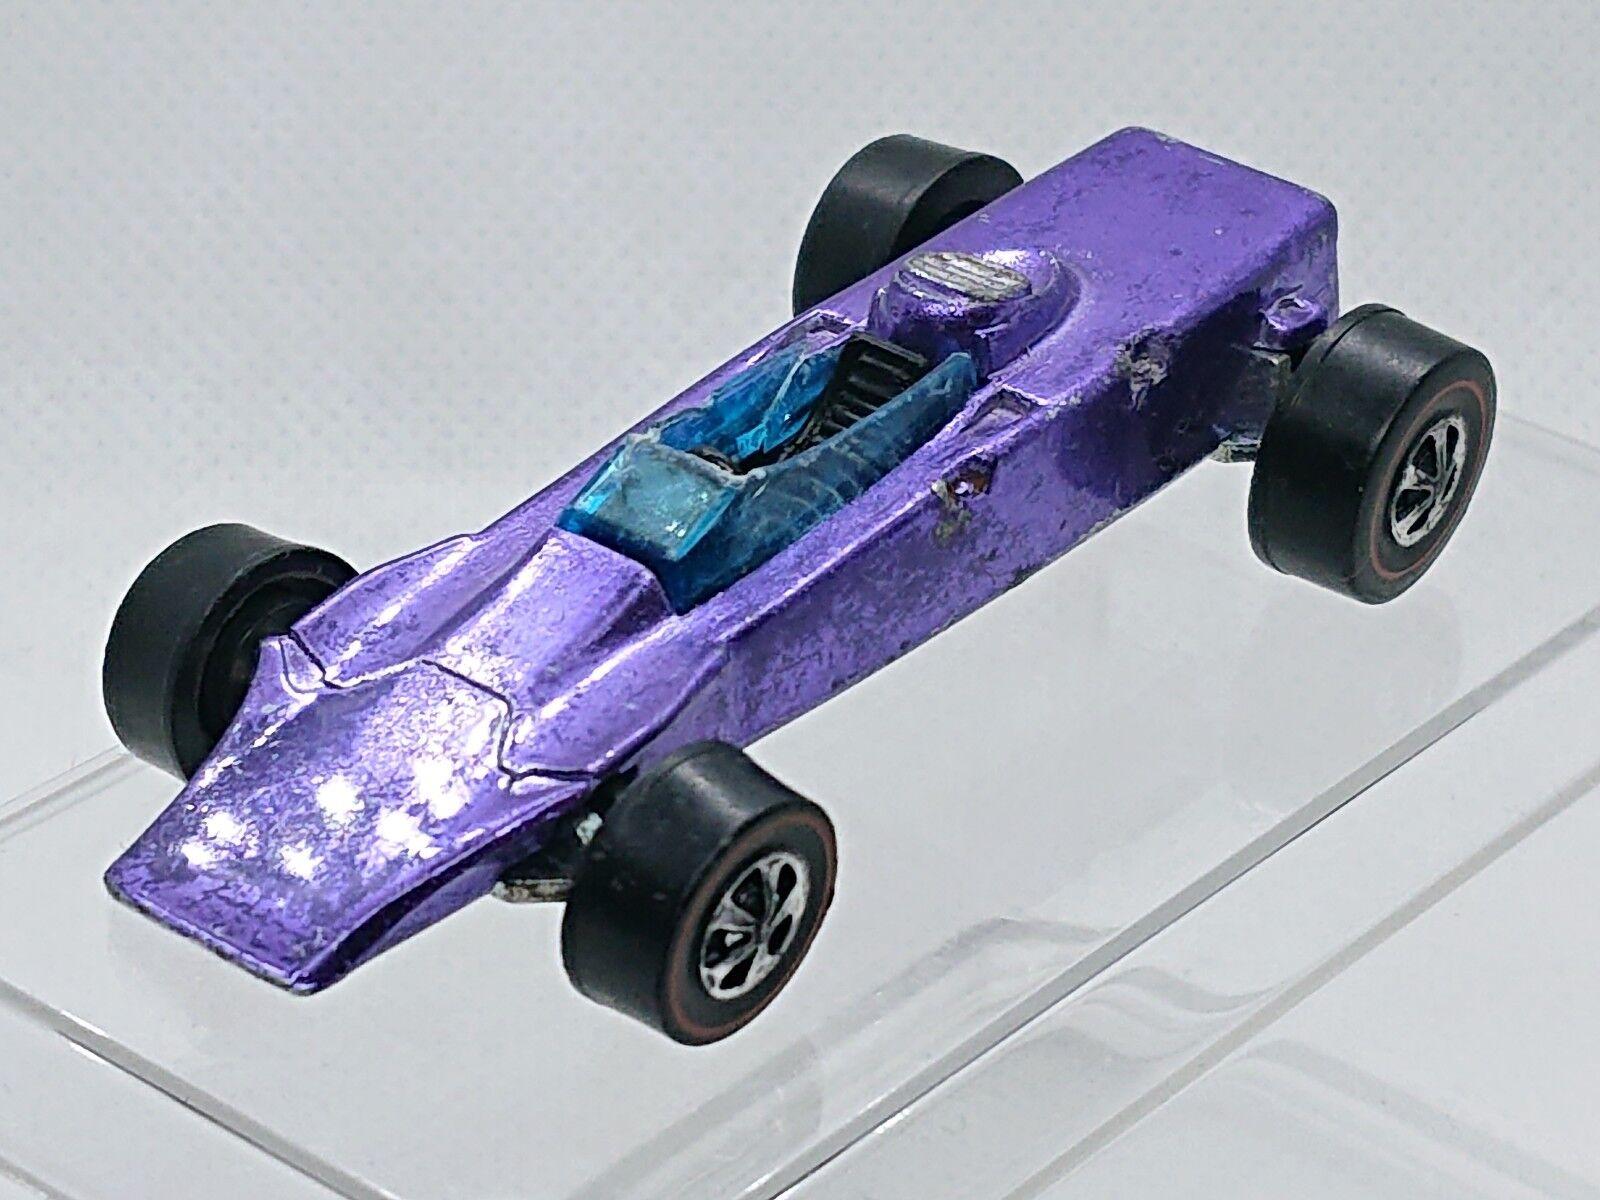 1969 Hot Wheels Lotus Turbina Spectraflame púrpura St   hw1154